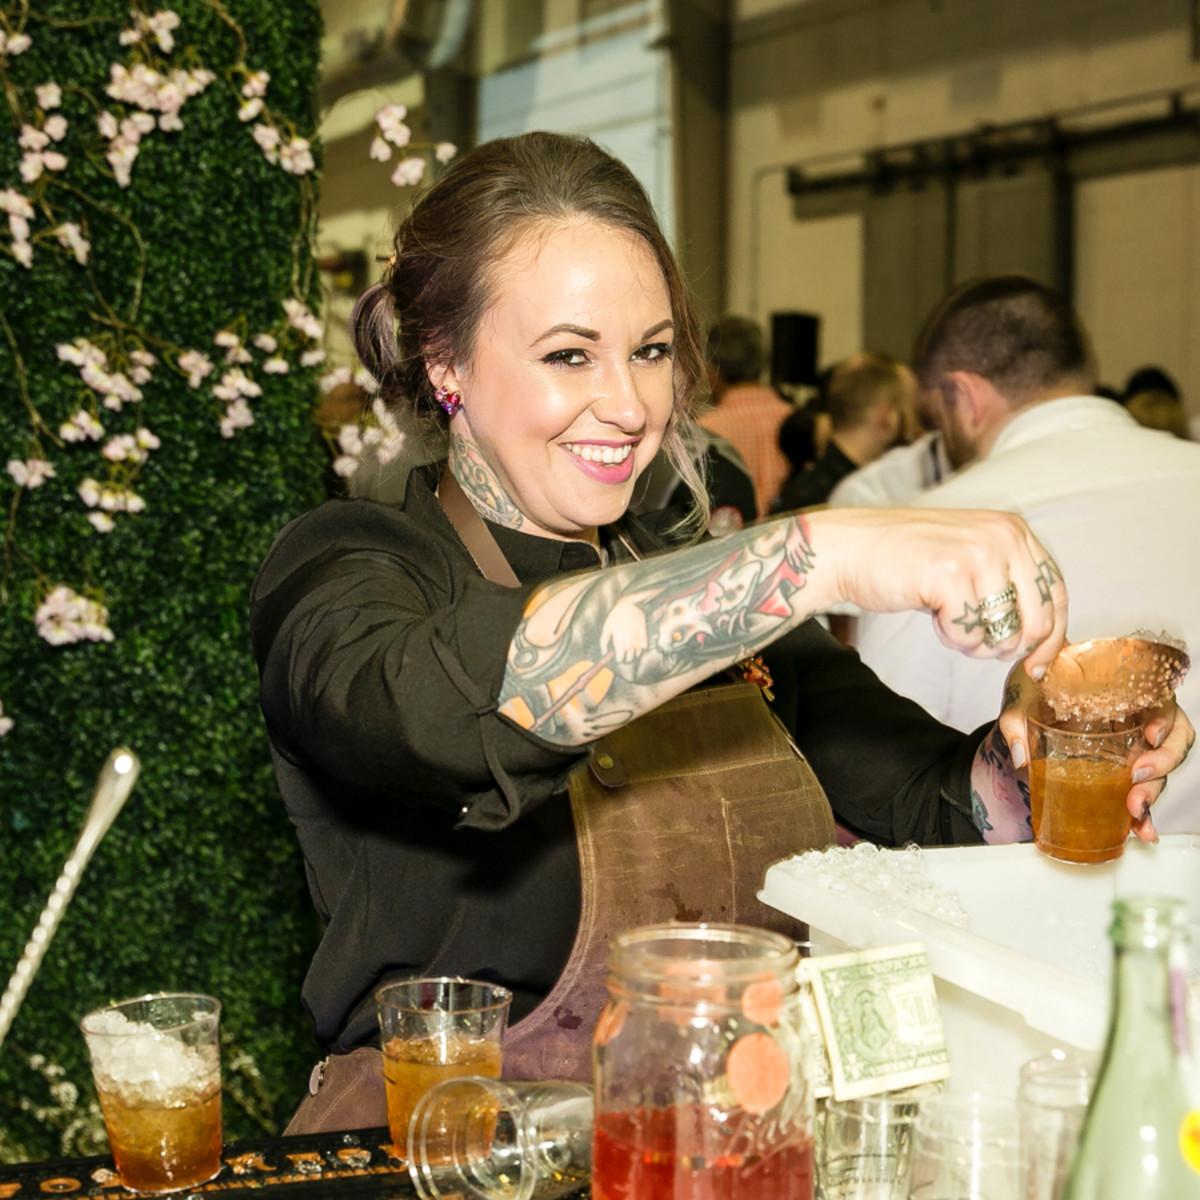 Tastemaker Awards 2018 bartender Leslie Ross Krockenberger